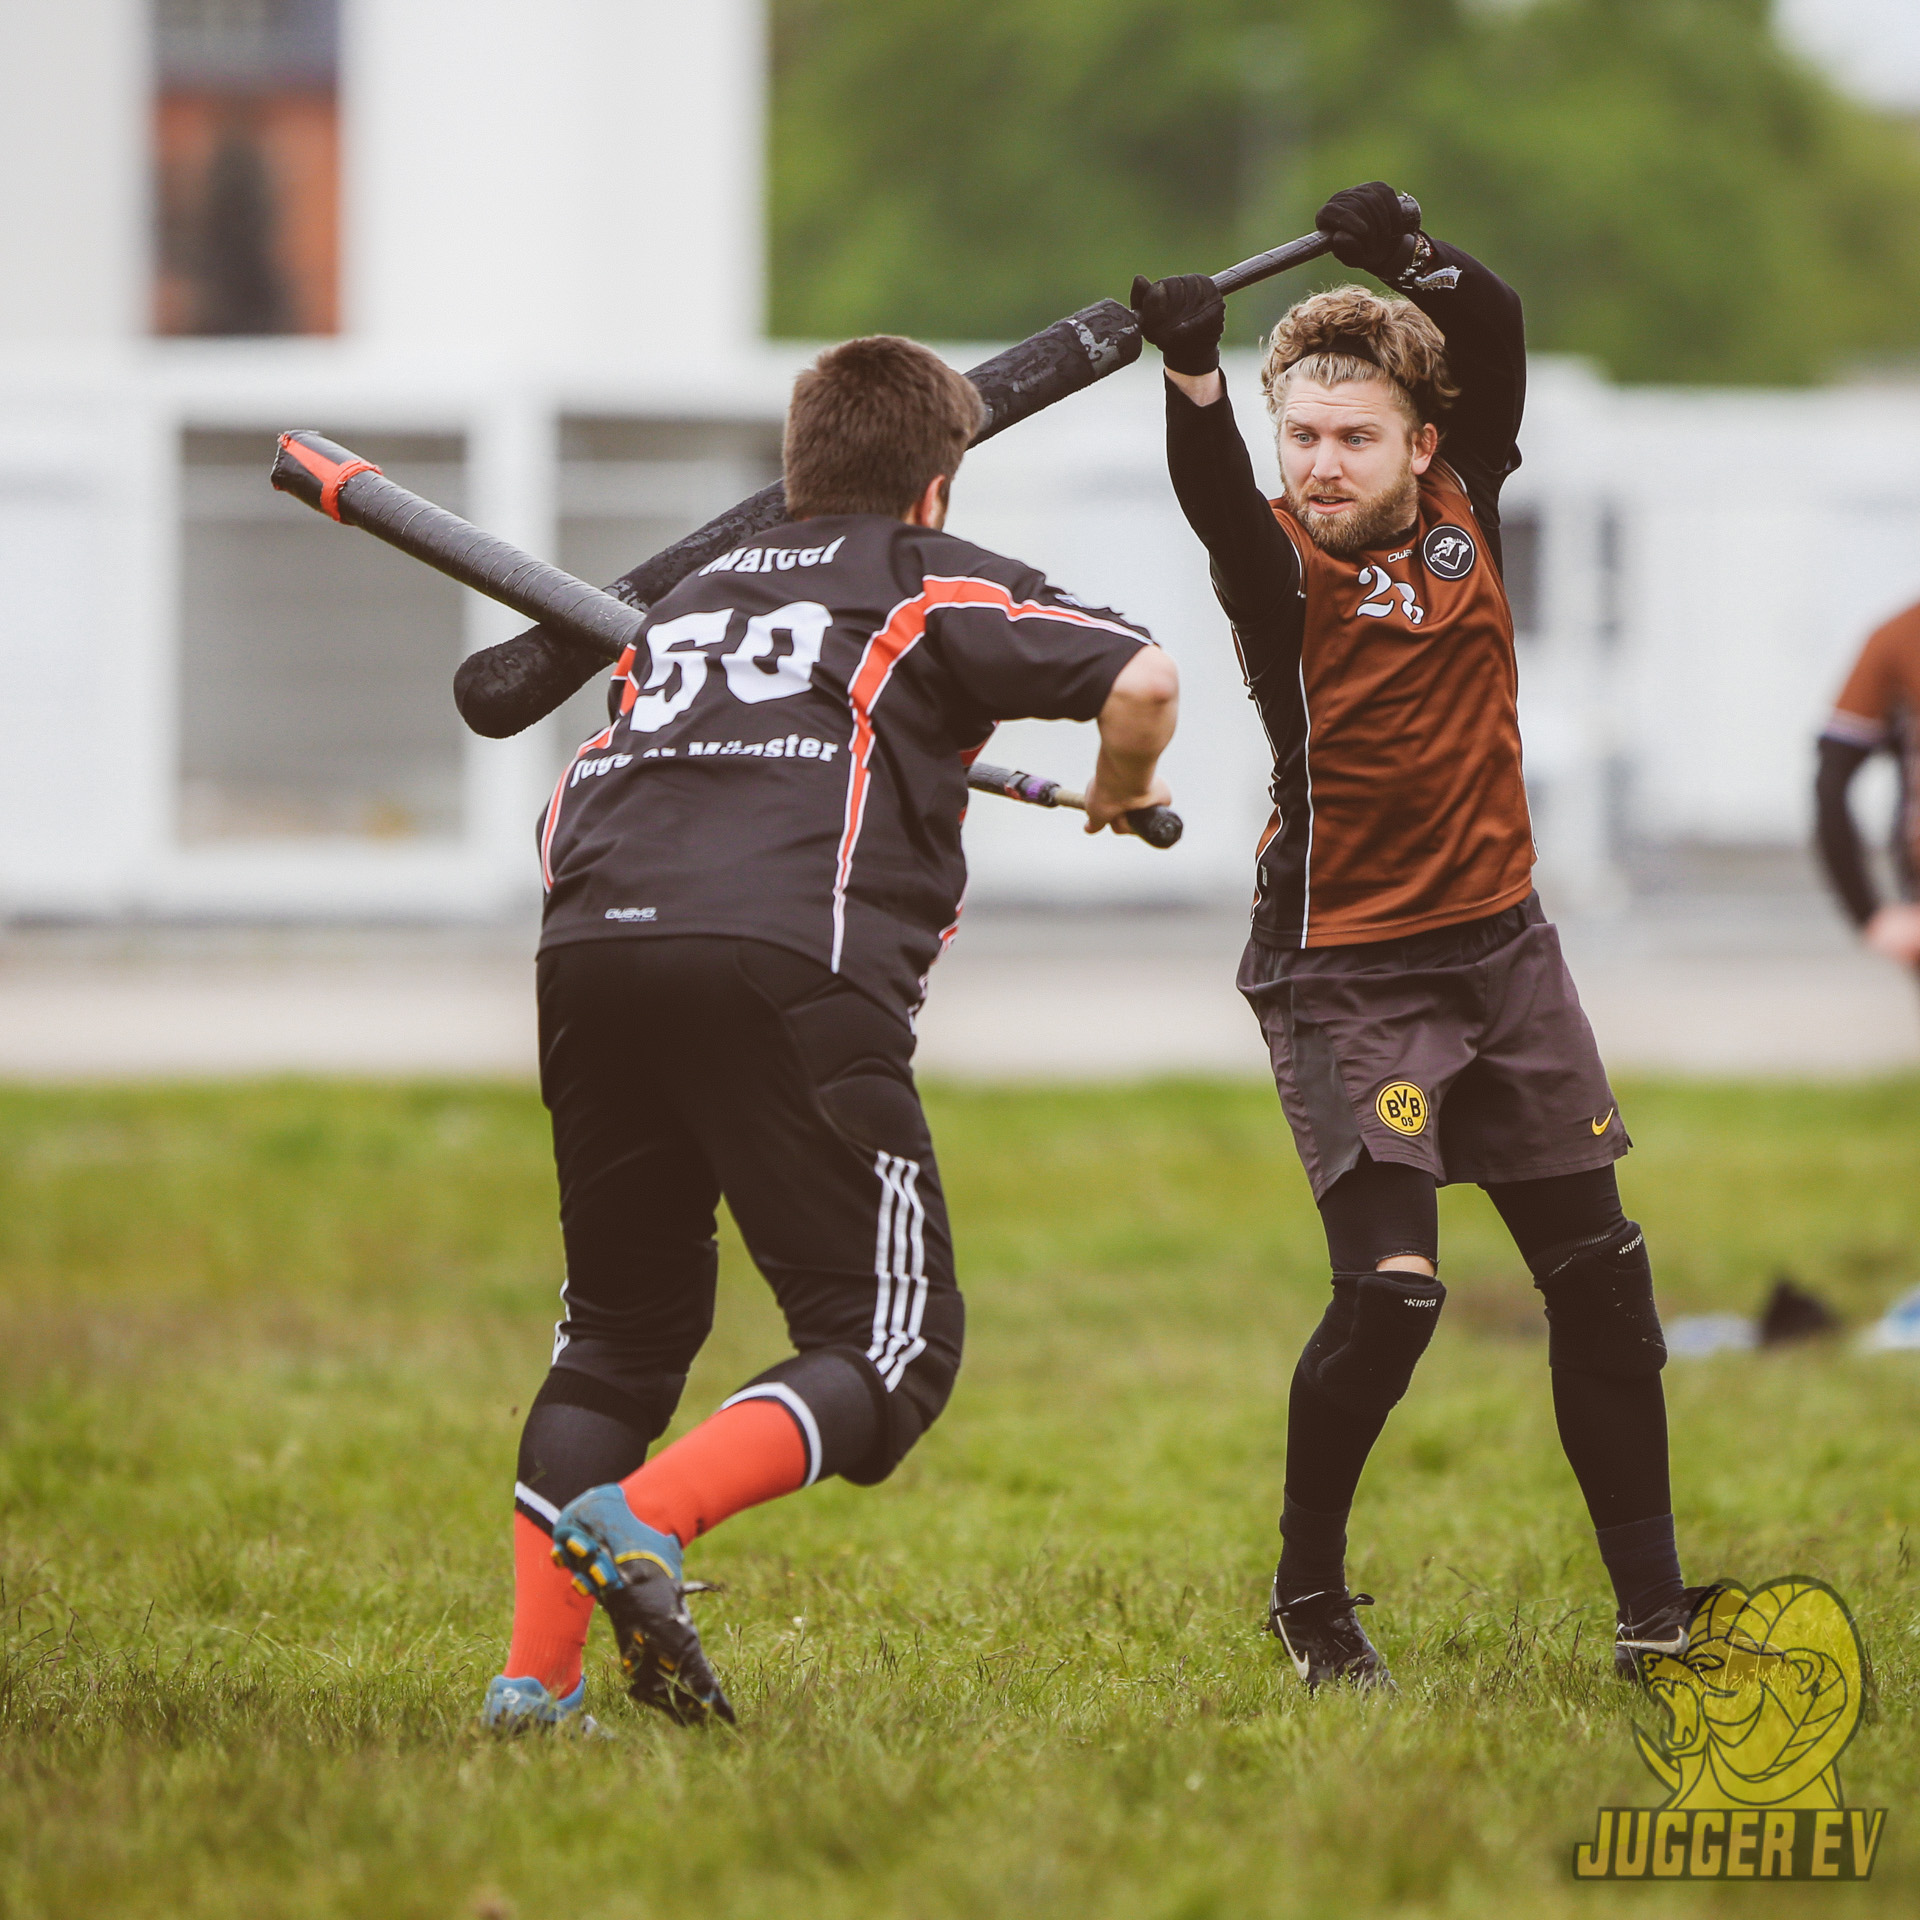 Berliner_Jugger_Pokal_2017-242